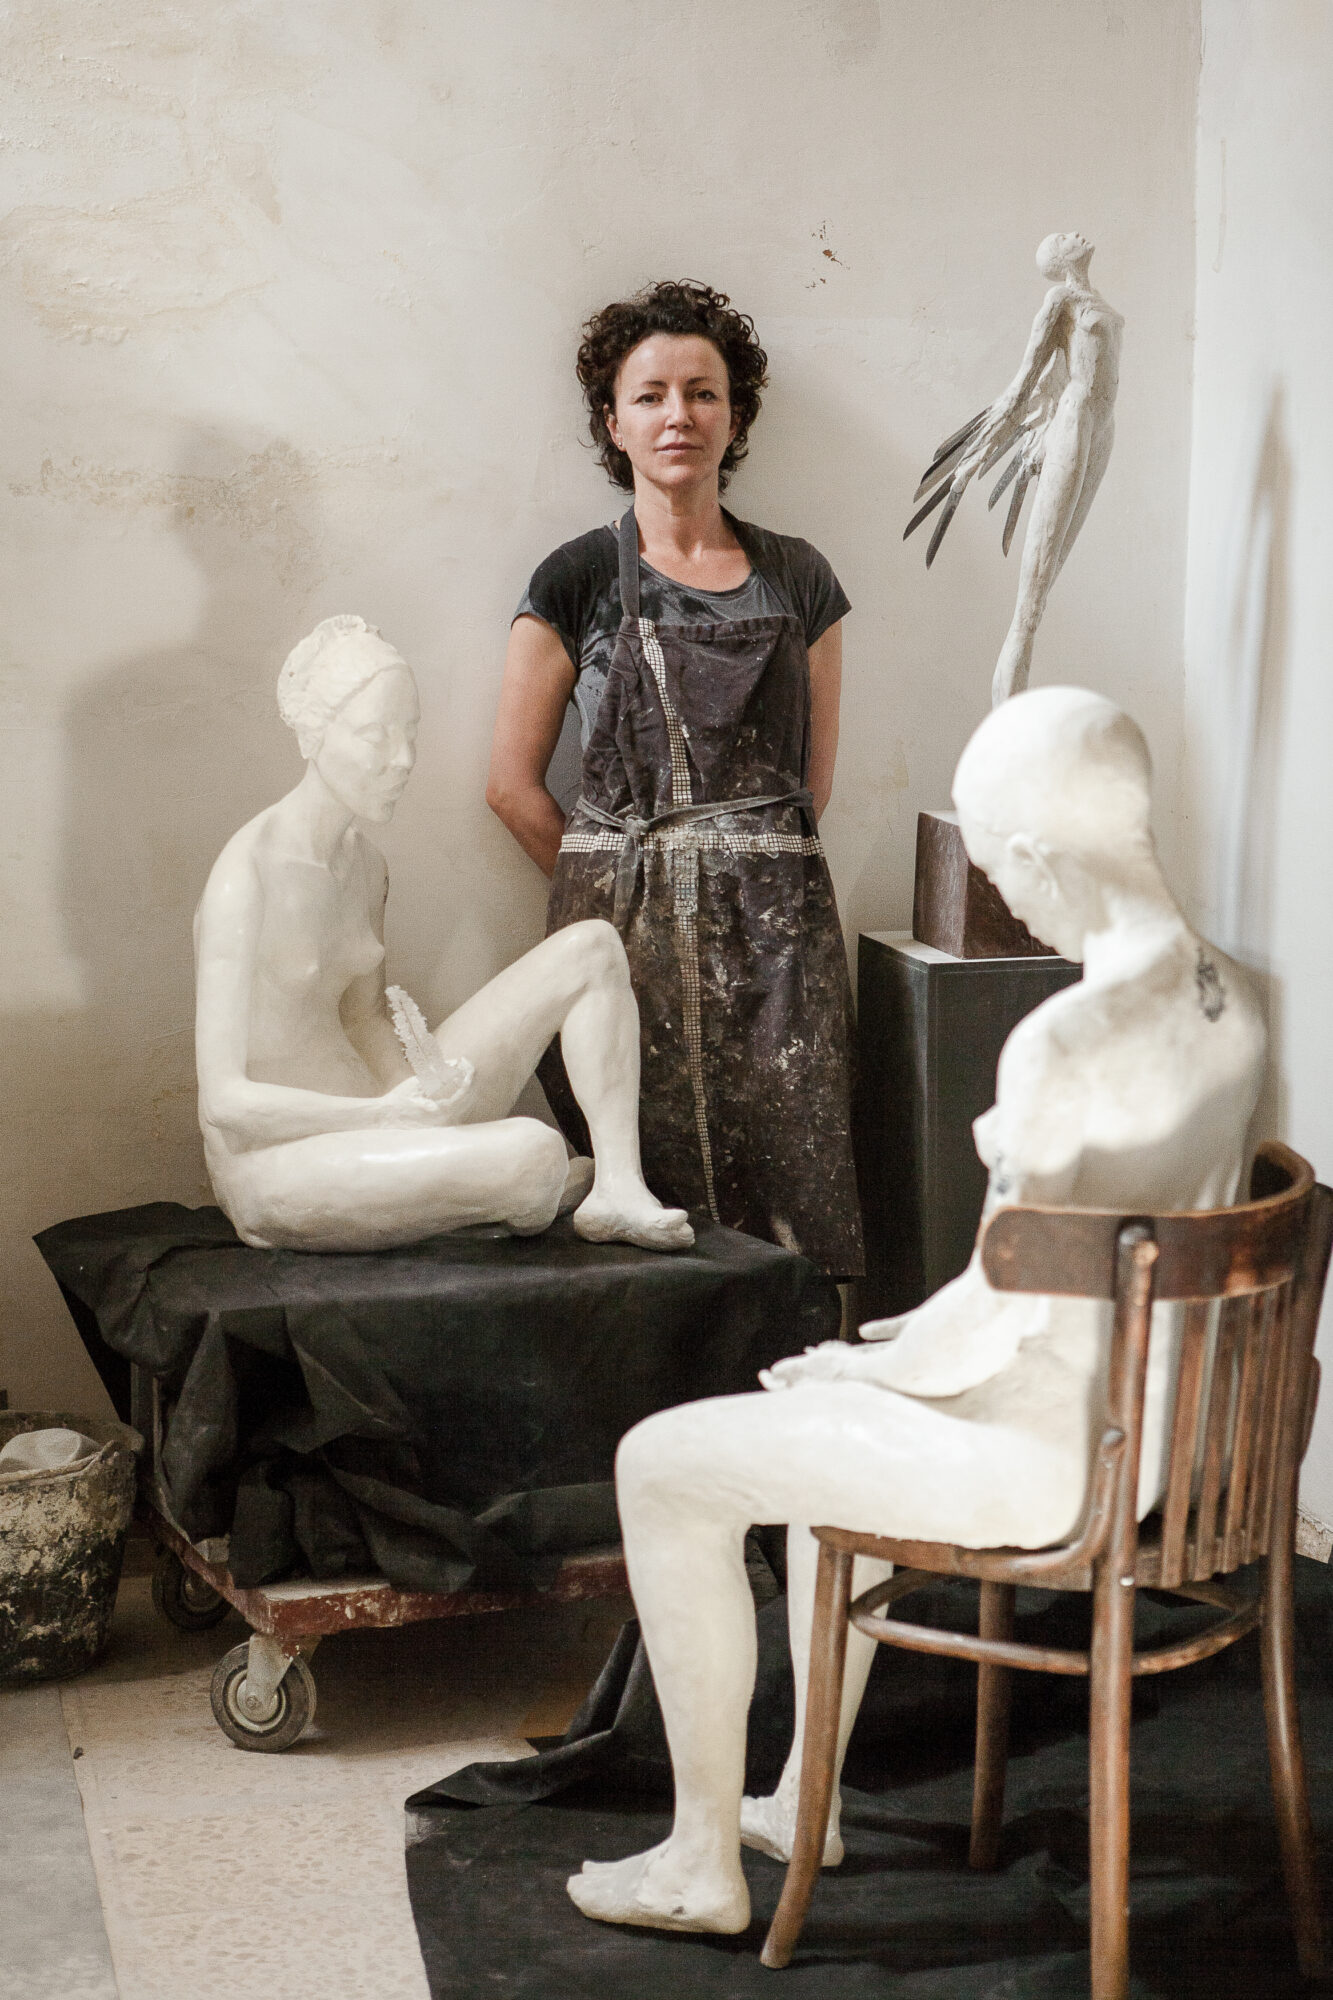 Studio shot by Nadette Clare Talbot